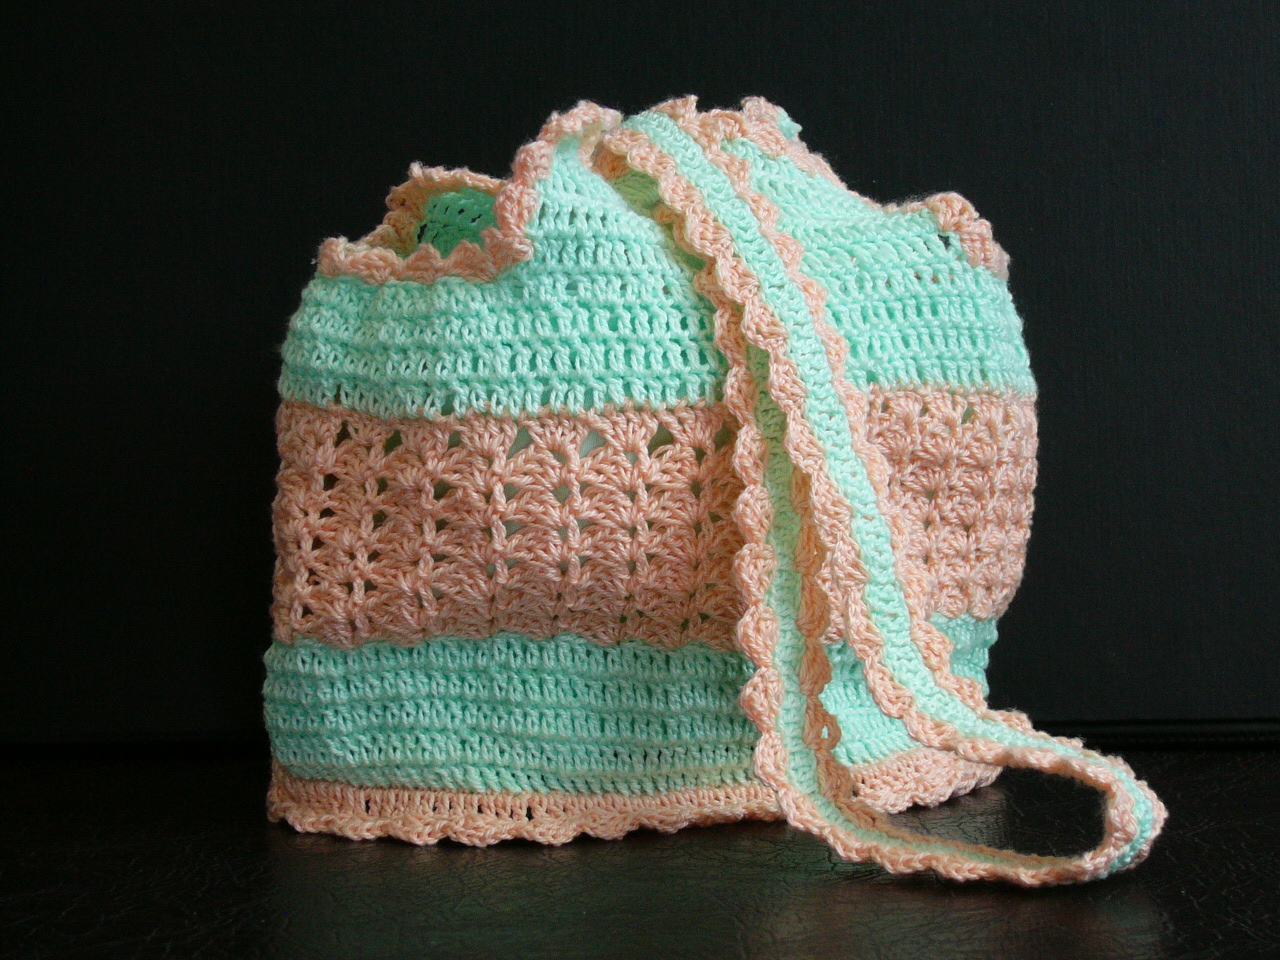 beaded wrist bag crochet 2007 vintage wrist bag crochet vintage design ...